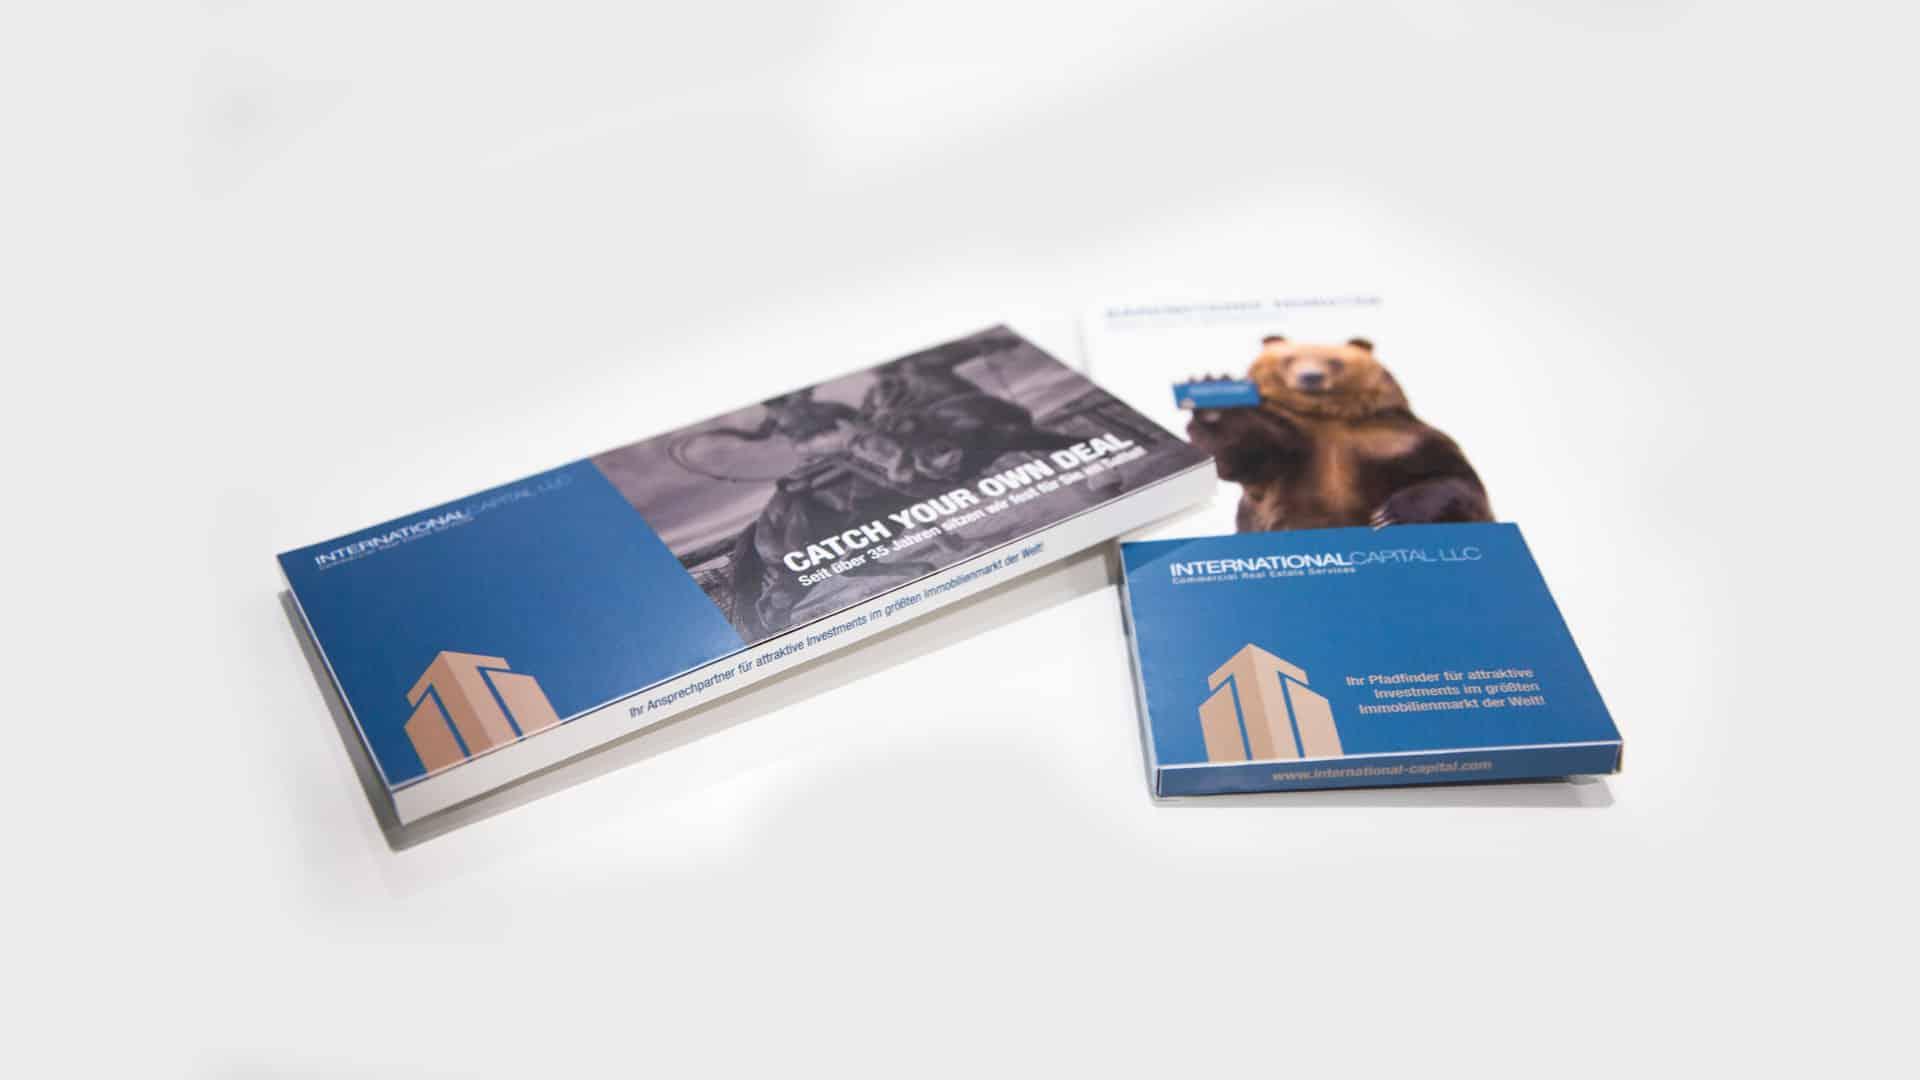 International Capital LLC Dallas Marketing für Immobilien